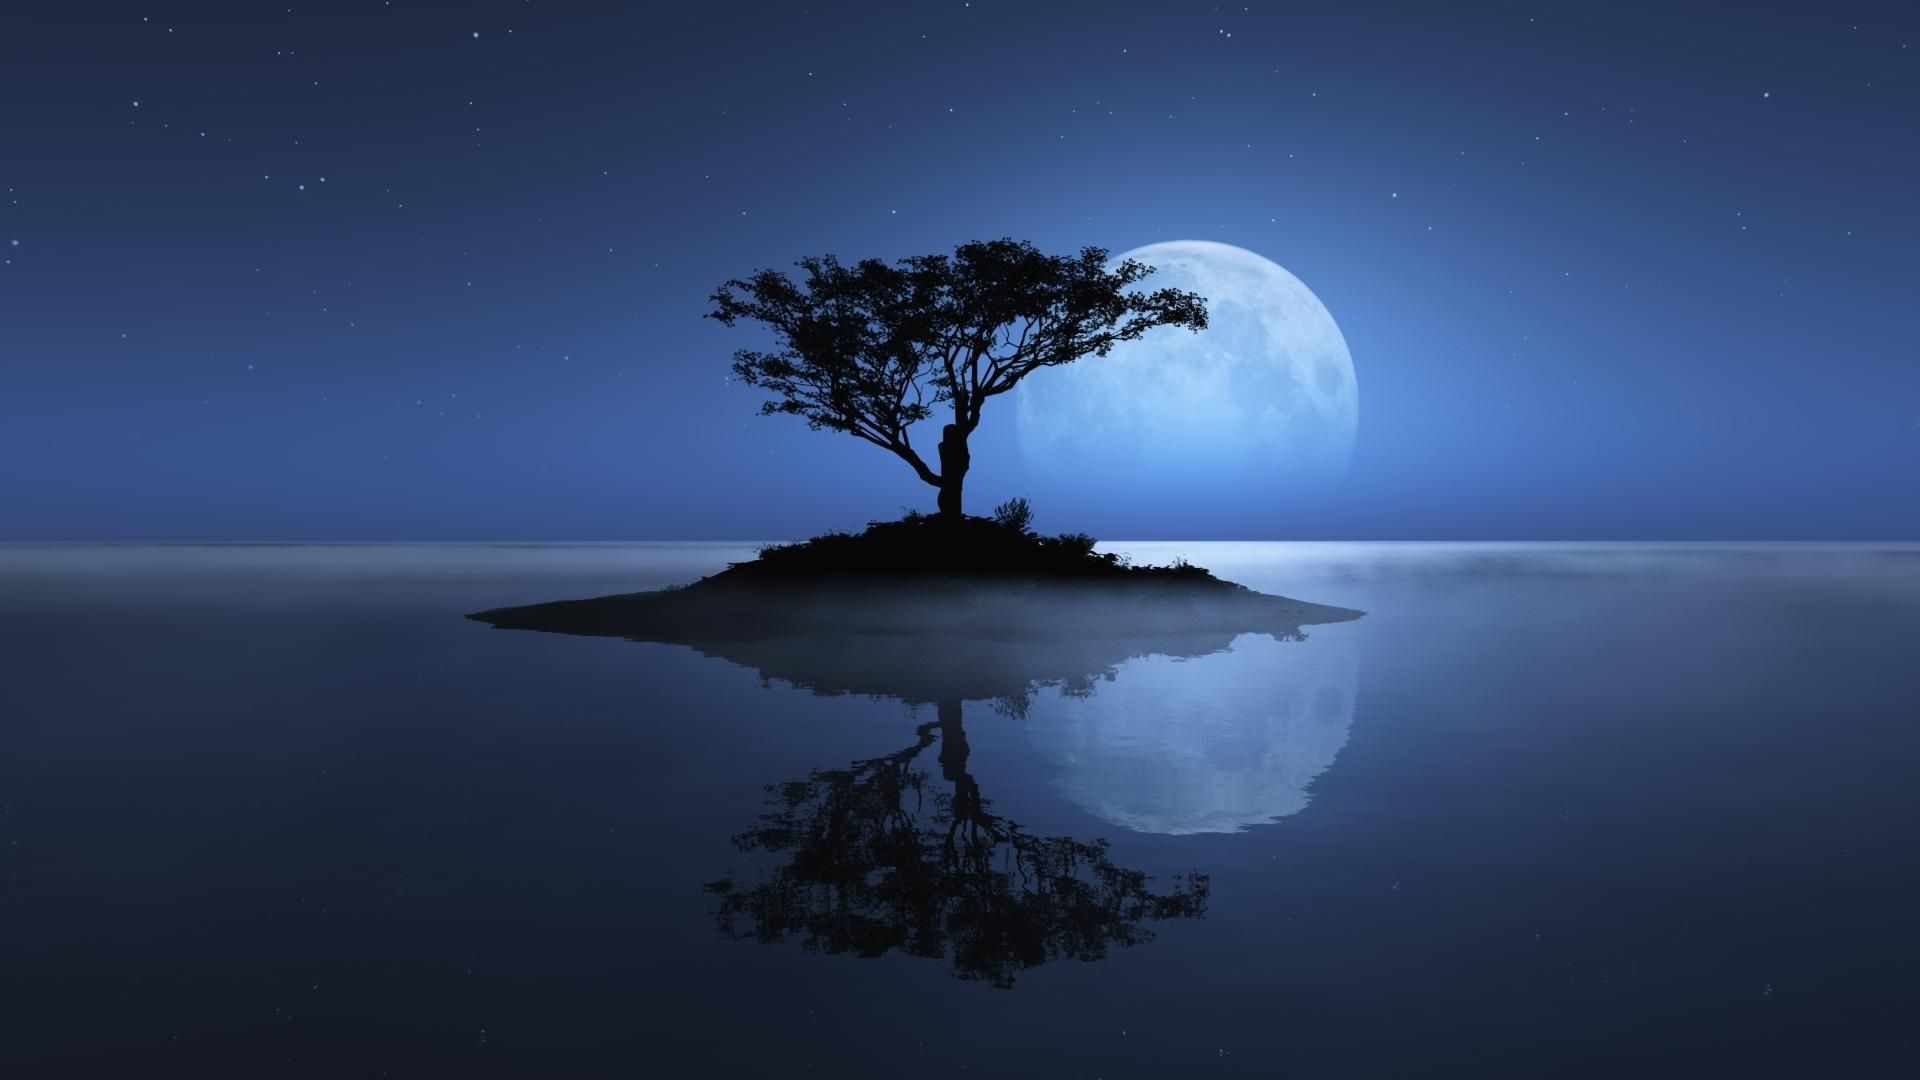 3d Nature Wallpaper Full Moon Night Nature Hd Wallpapers 1080p Widescreen Hd Wallpapers